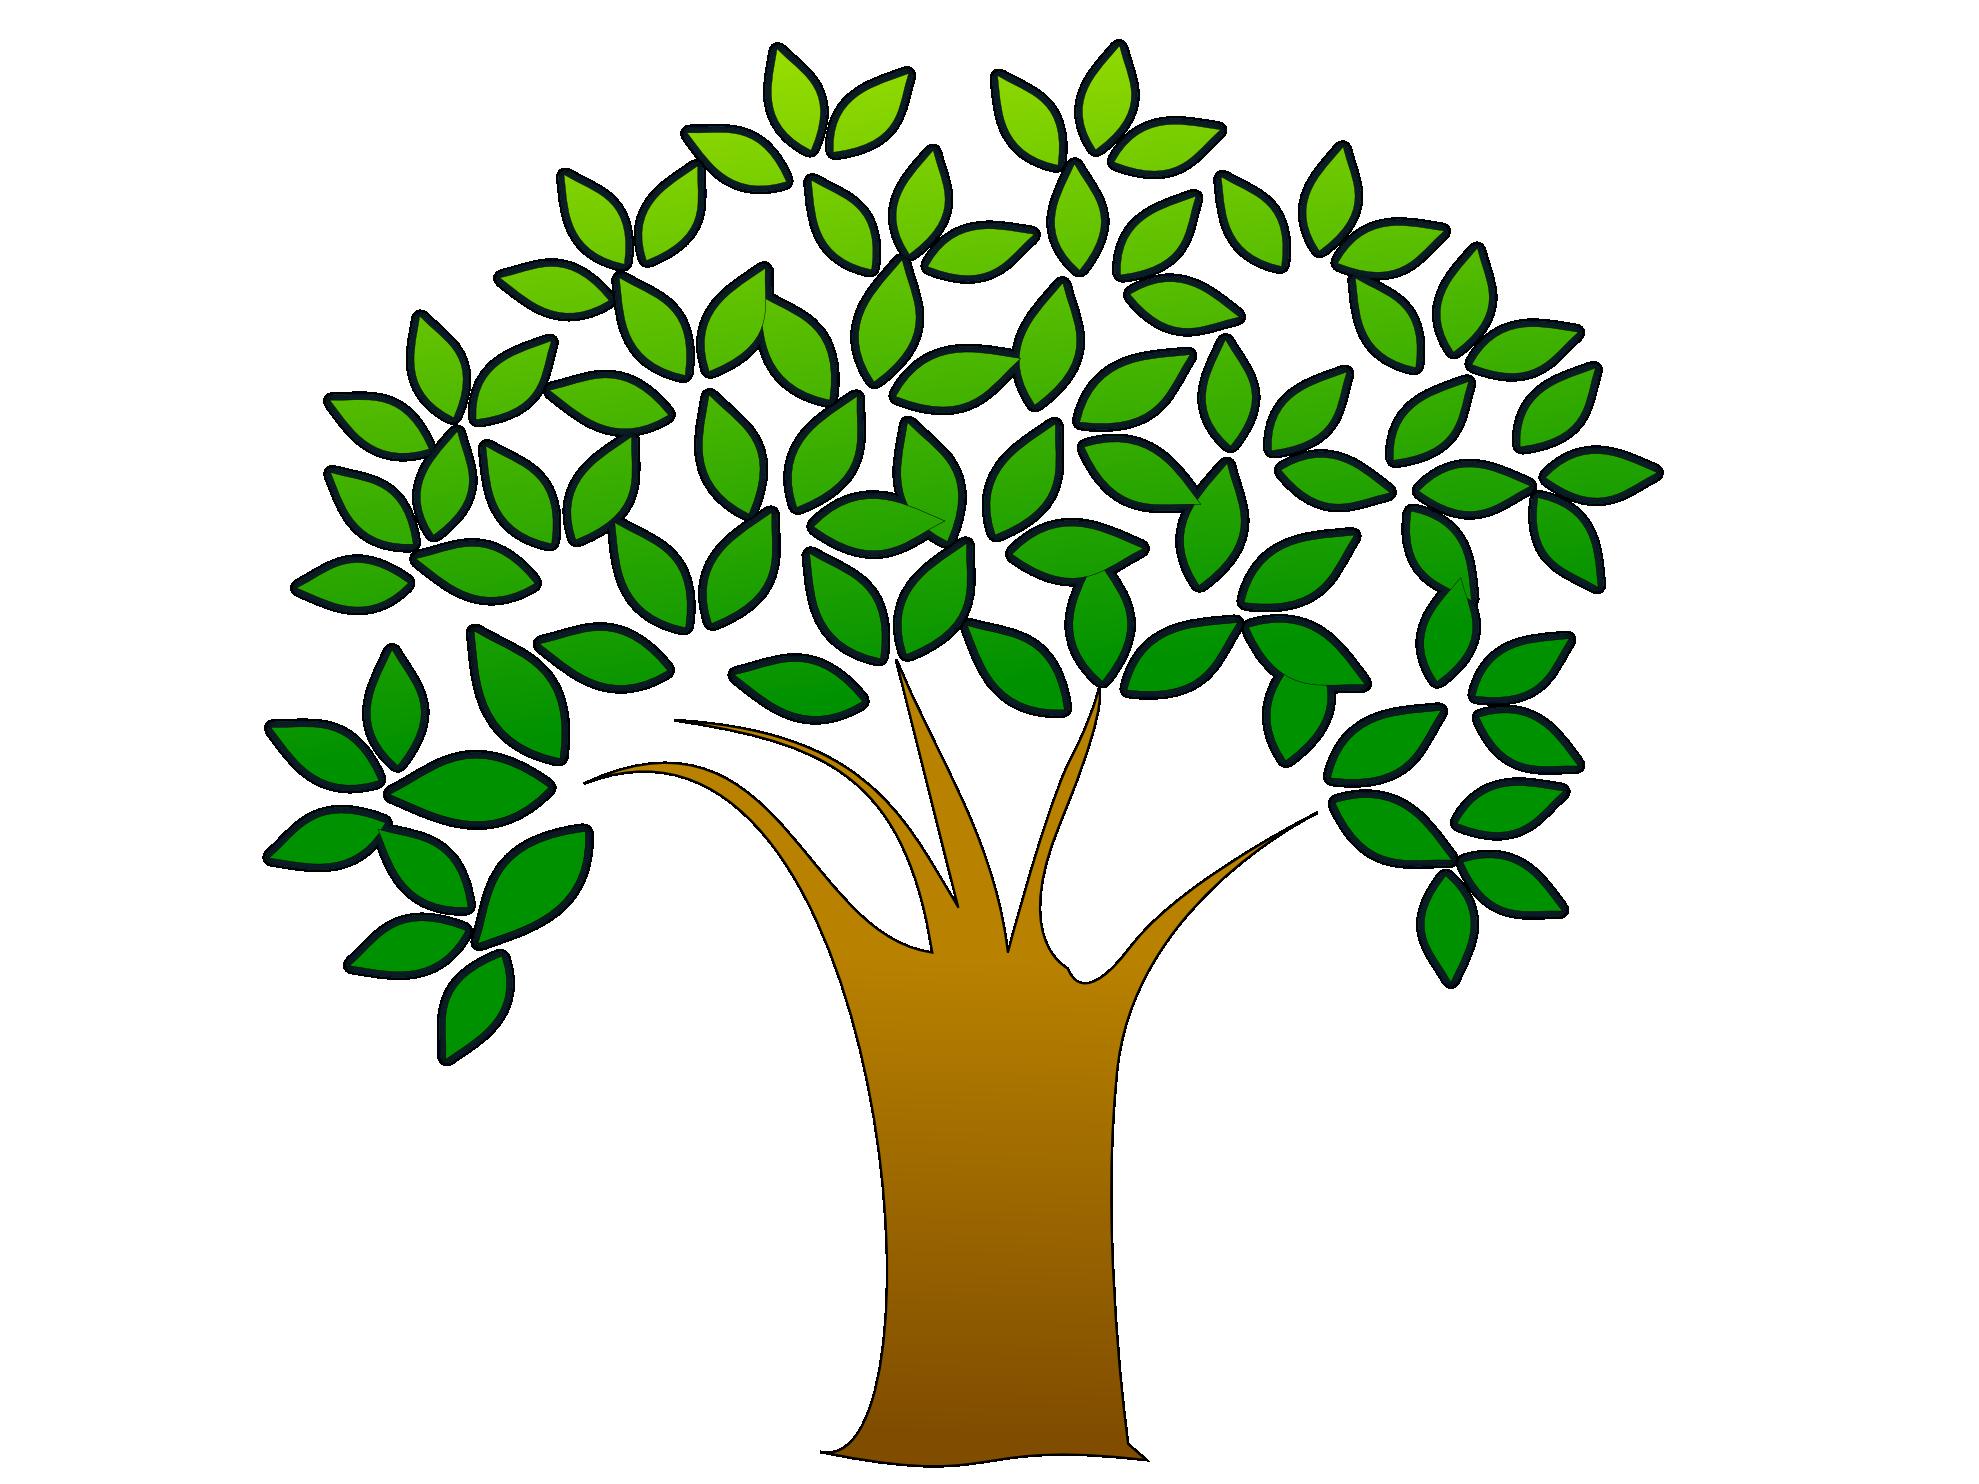 Peace tree clipart clip freeuse stock Free Hope Tree Cliparts, Download Free Clip Art, Free Clip ... clip freeuse stock